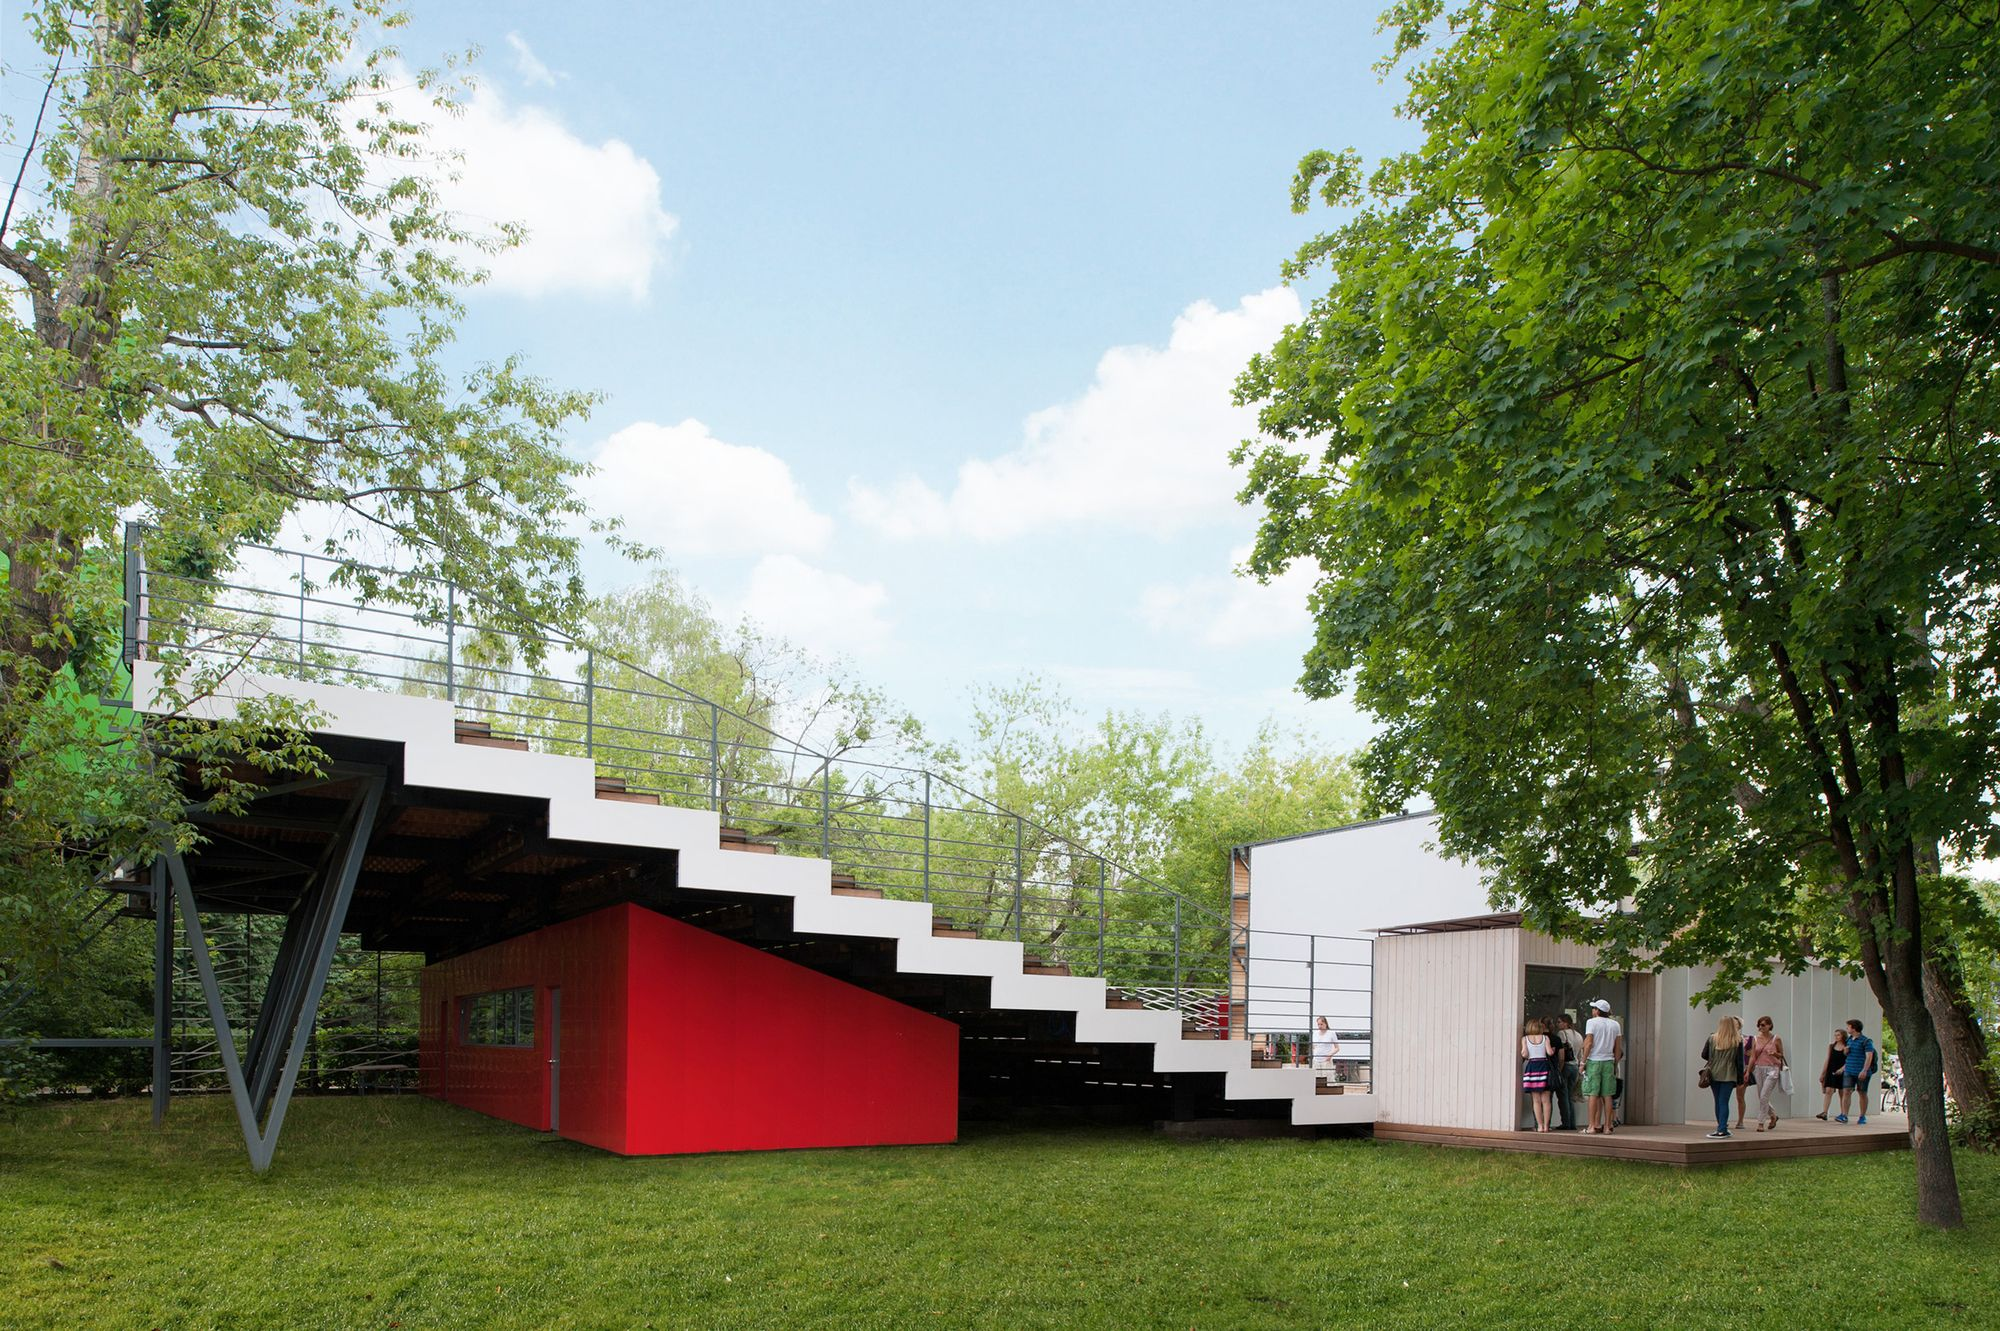 Summer cinema wowhaus architecture bureau urbanistica